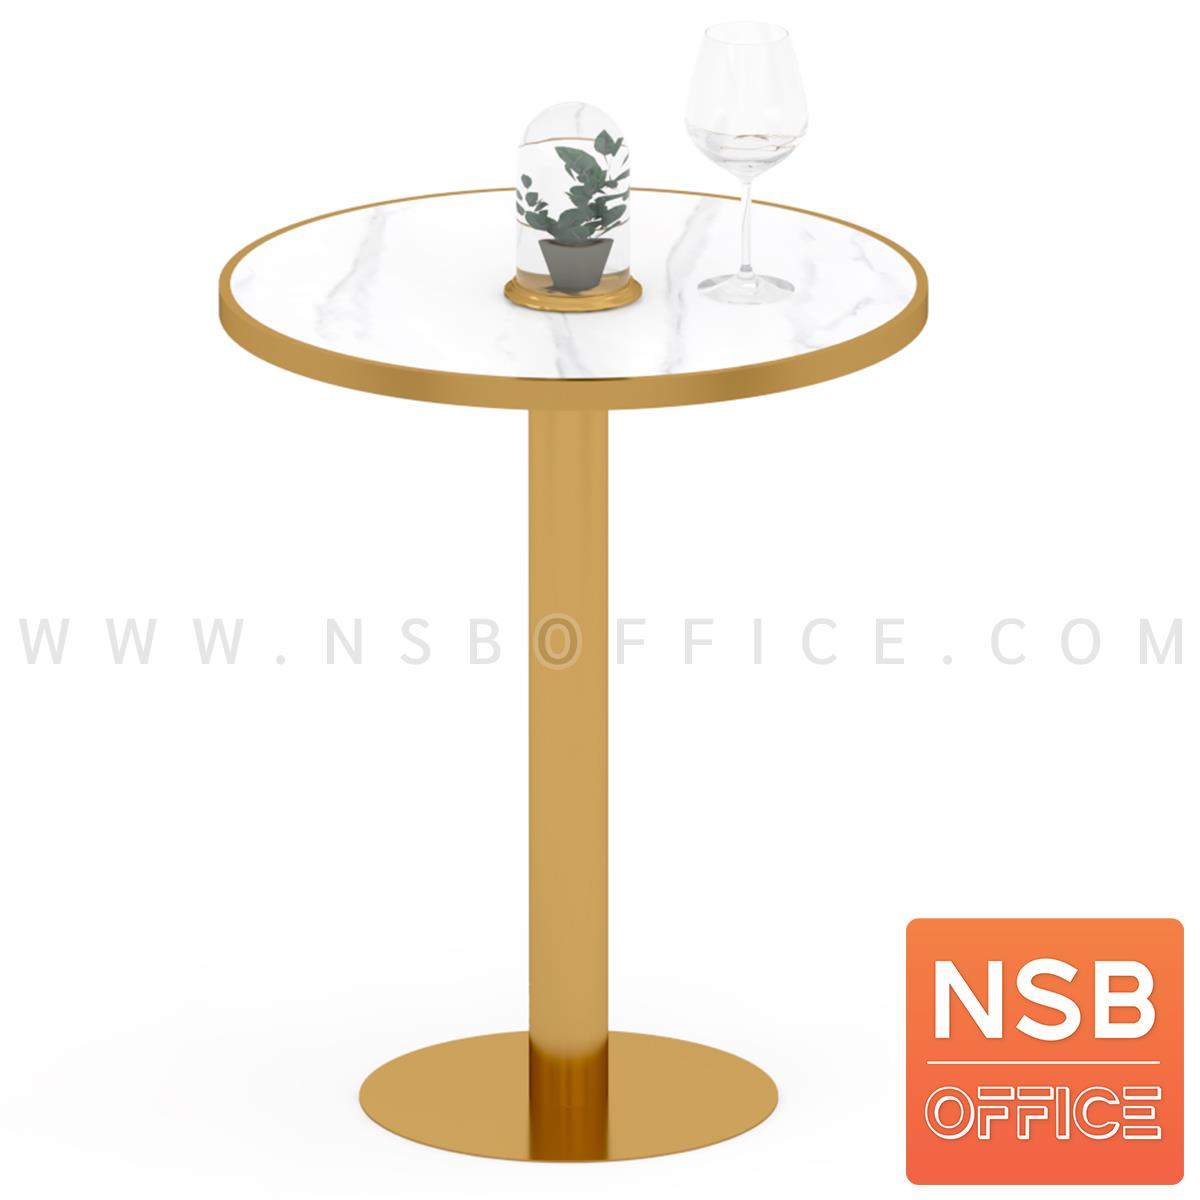 A14A284:โต๊ะบาร์ COFFEE รุ่น Kristel (คริสเทล)  หน้าท็อปหินอ่อน โครงขาสเตนเลสสีทอง